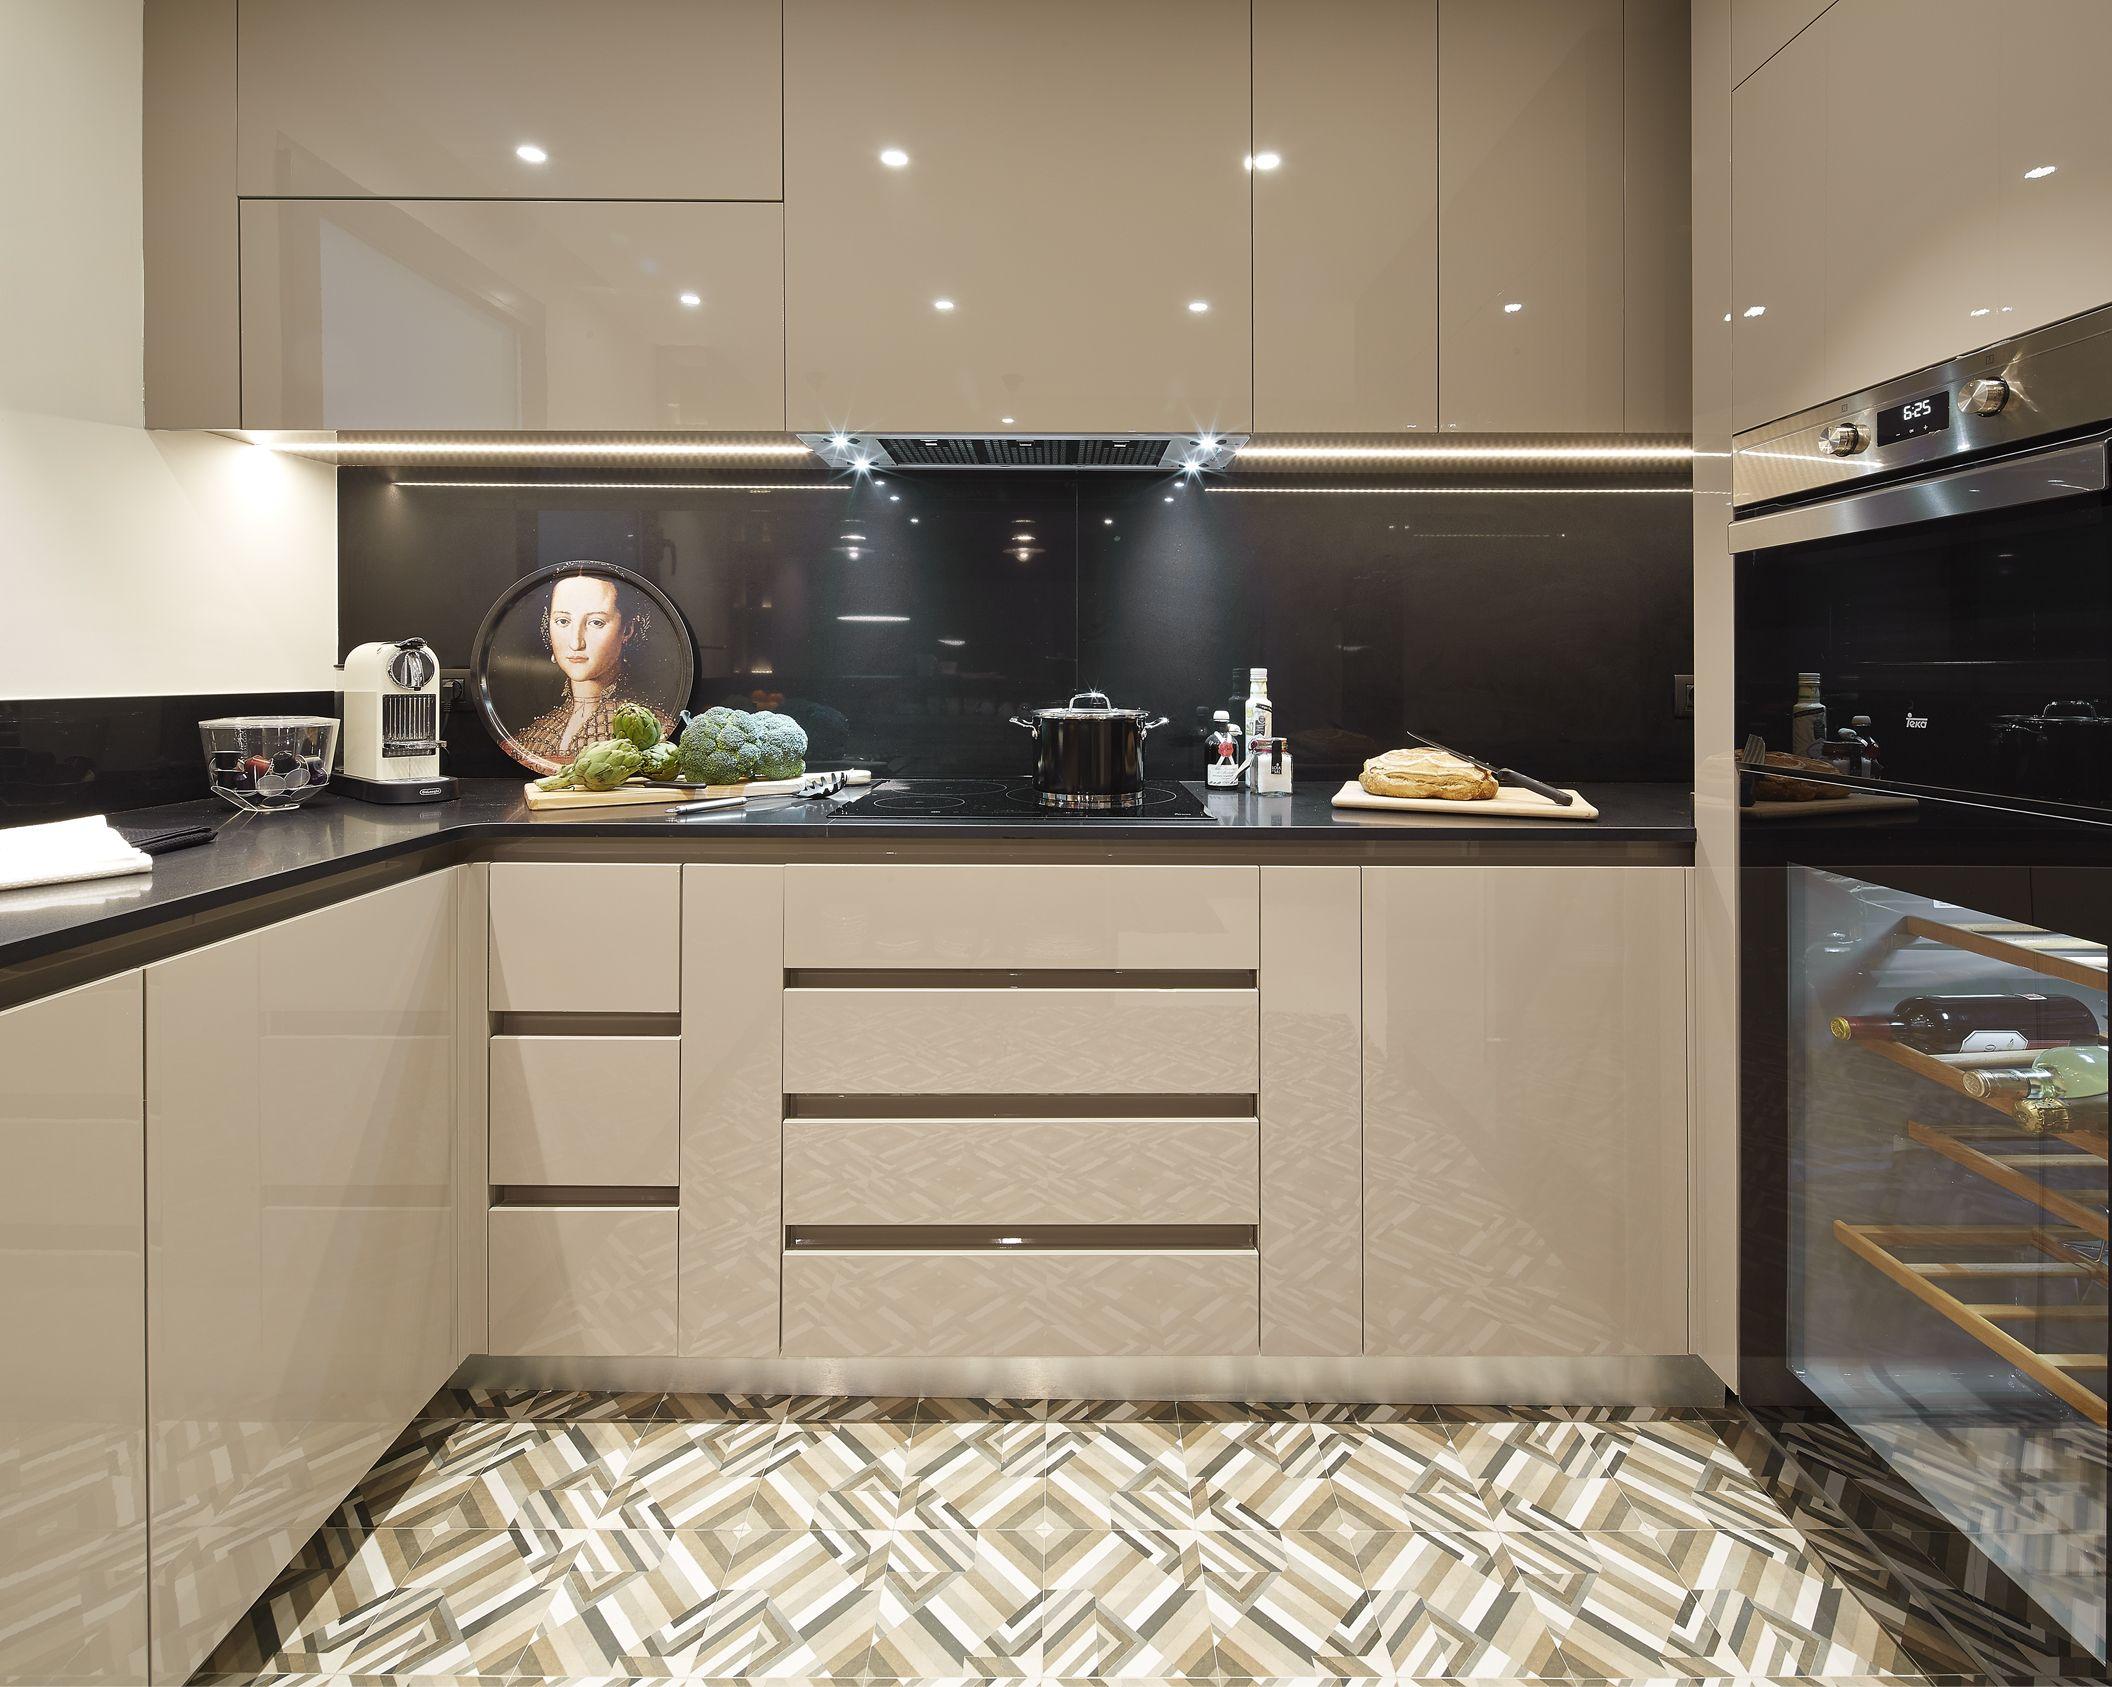 Molins interiors arquitectura interior interiorismo - Decoracion cocina comedor ...